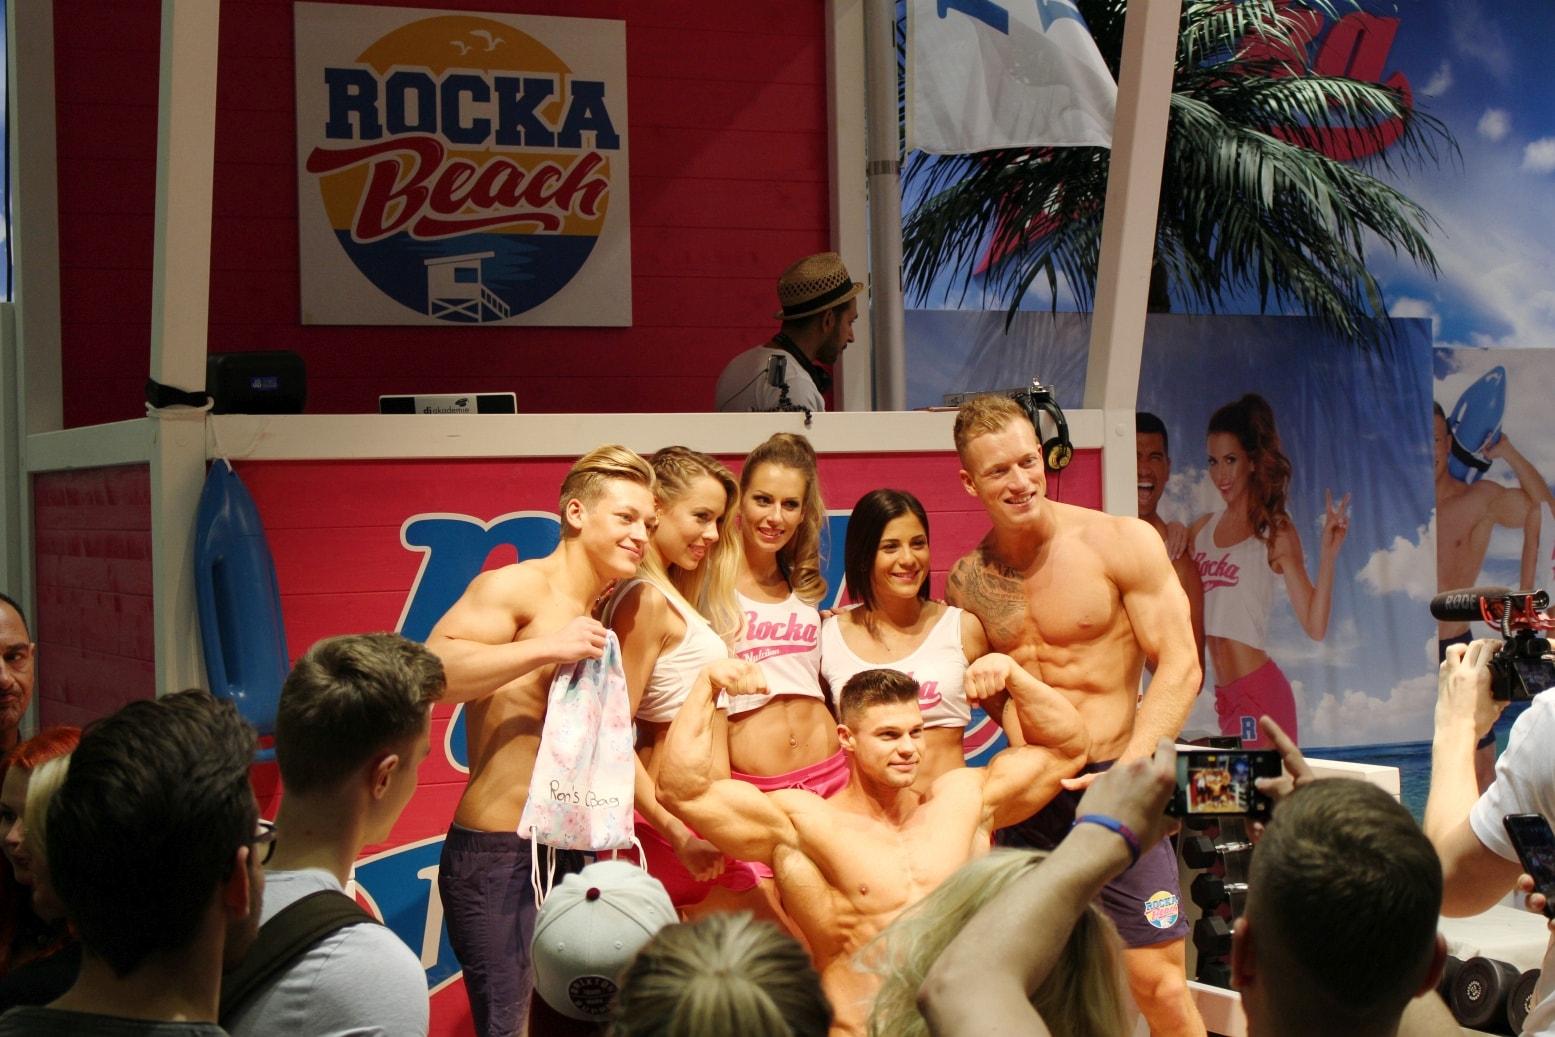 Fibo 2017, Fitness, Messe, Köln, Rocka Nutrition, Smartgains, Benjamin, Burkhardt, Sally, Schmale Schulter